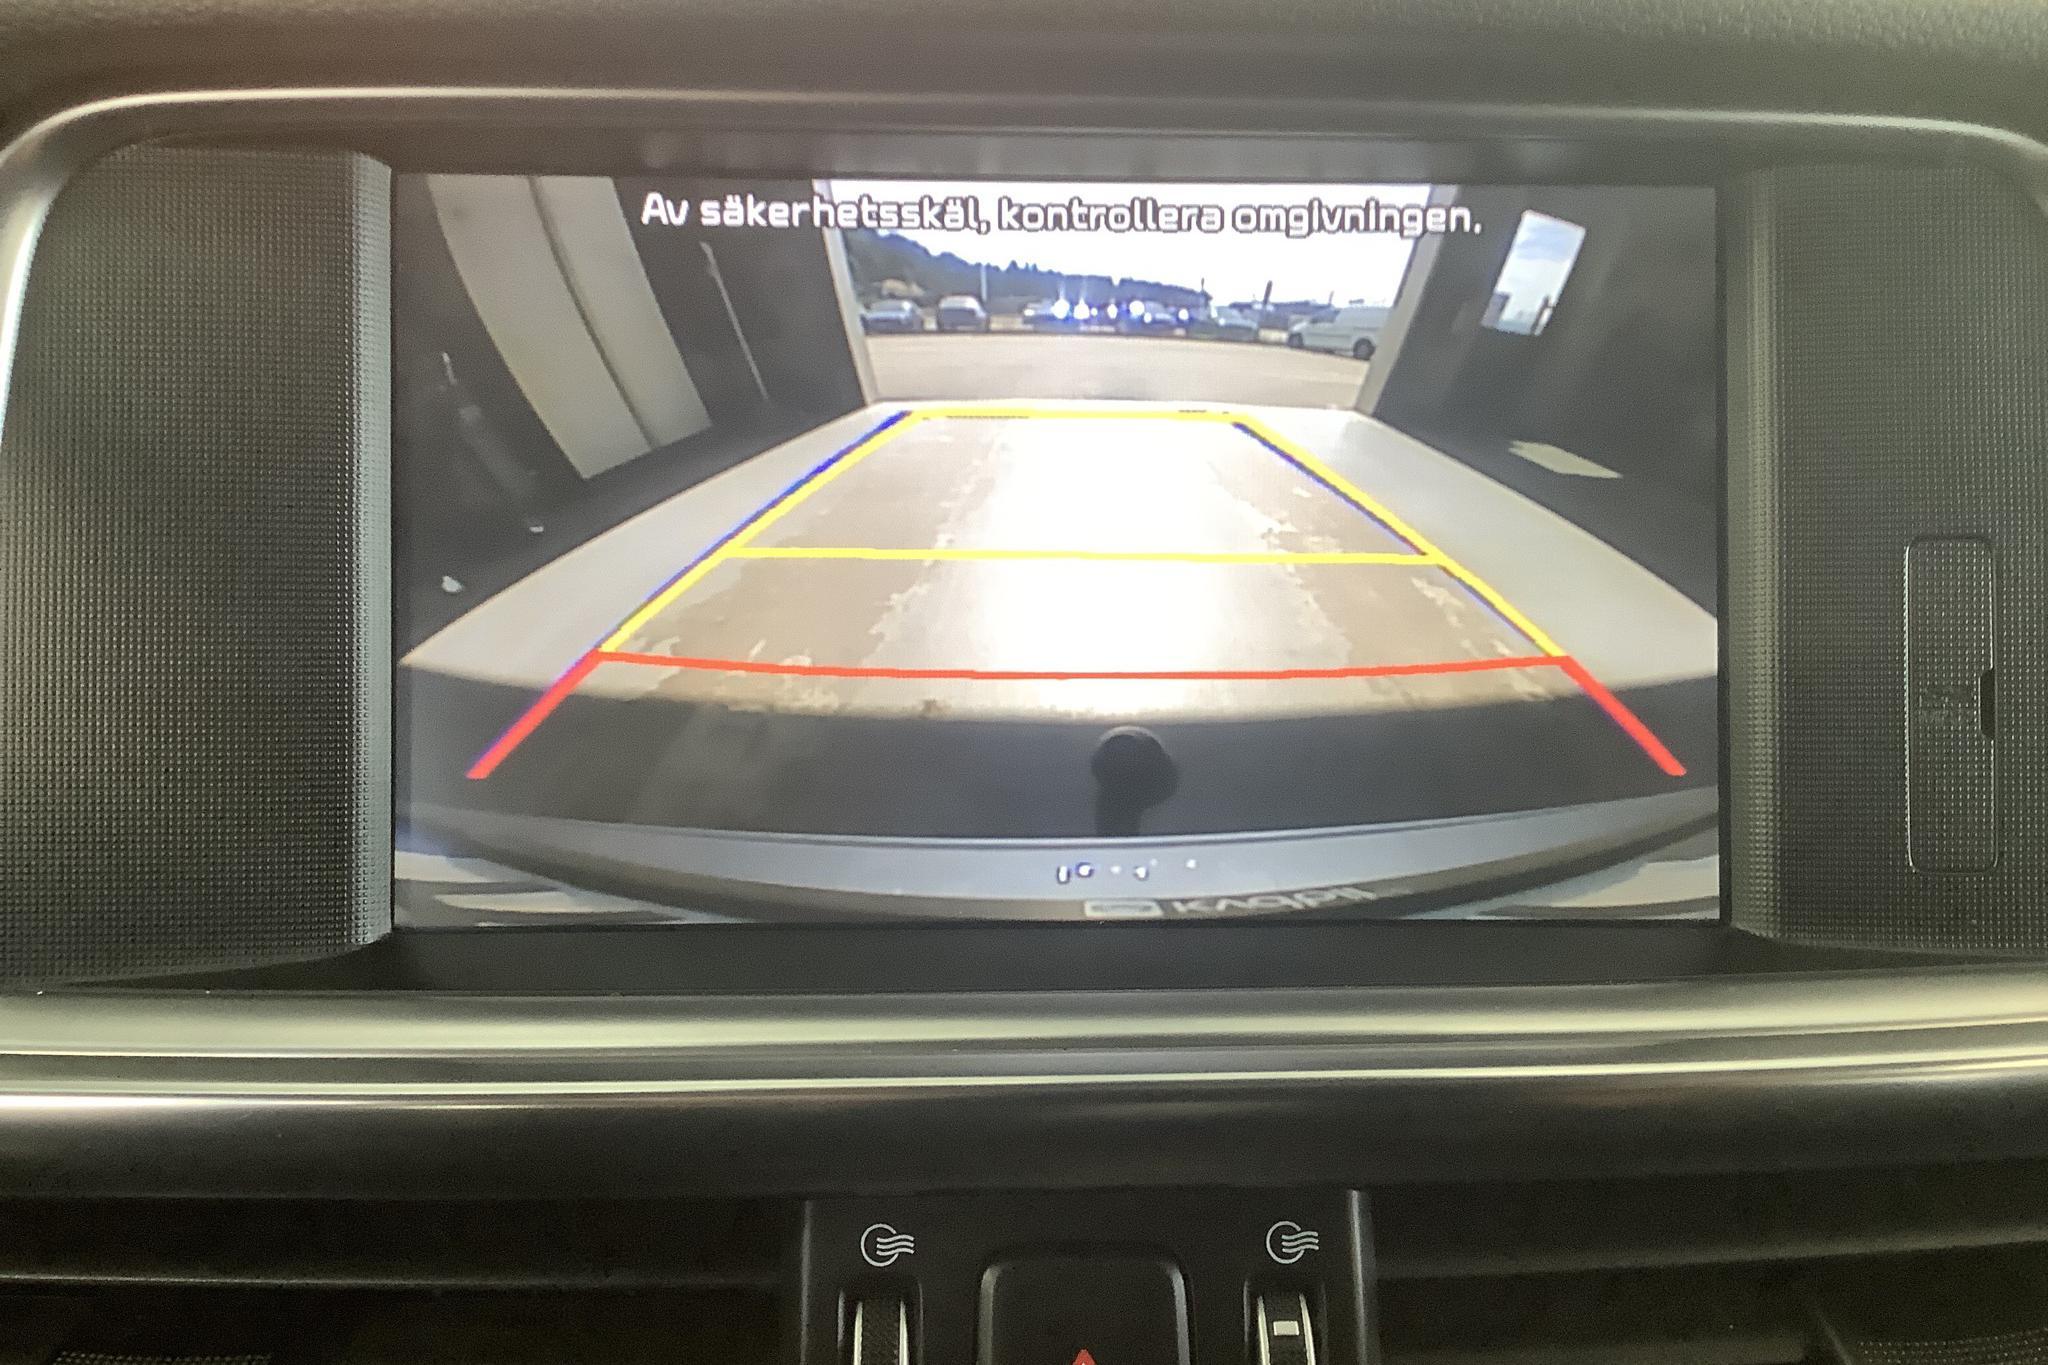 KIA Optima 2.0 GDi Plug-in Hybrid SW (205hk) - 59 280 km - Automatic - gray - 2018